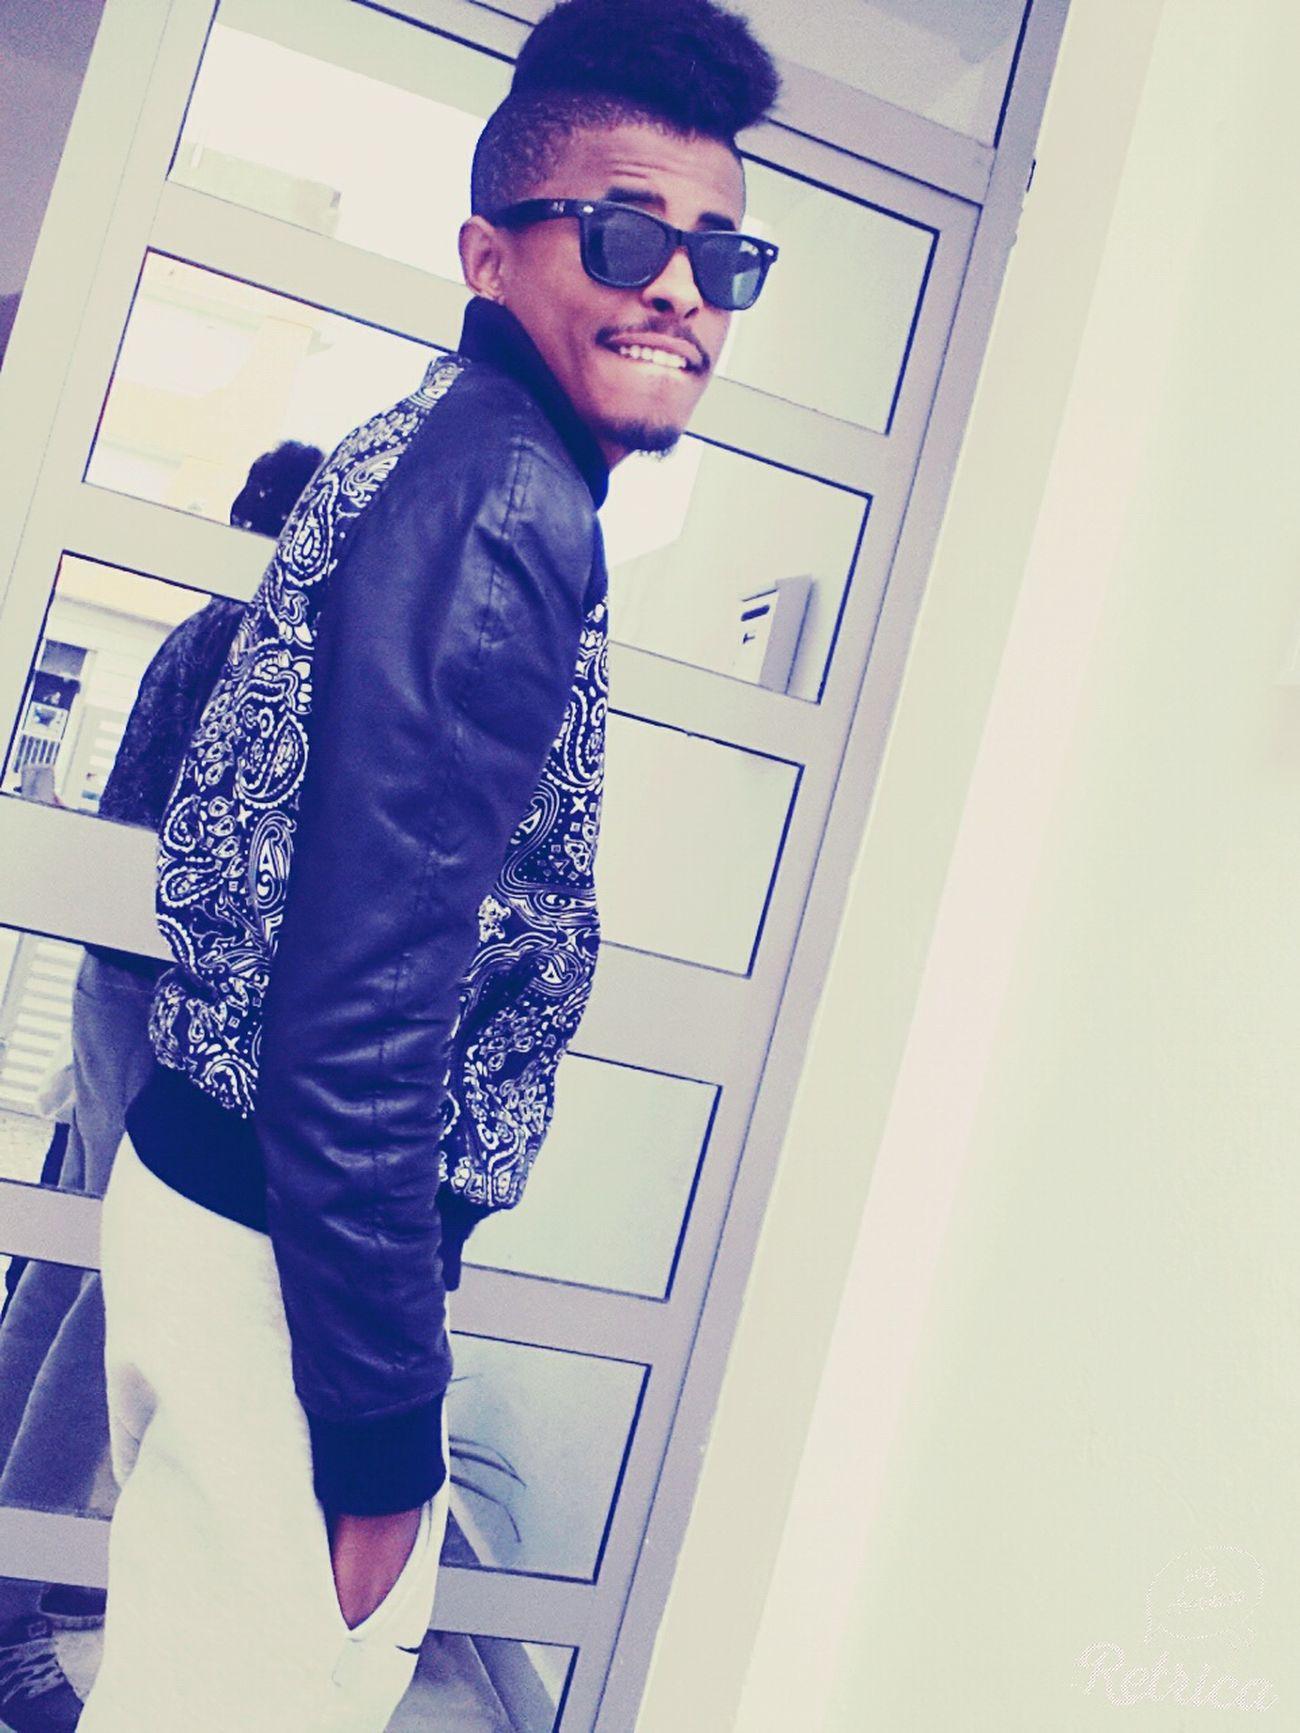 Fashion Beatiful SWAG ♥ Selfie ✌ Metissage. Handsome Boy Fashion&love&beauty Stylish SAWG Fashion Hair